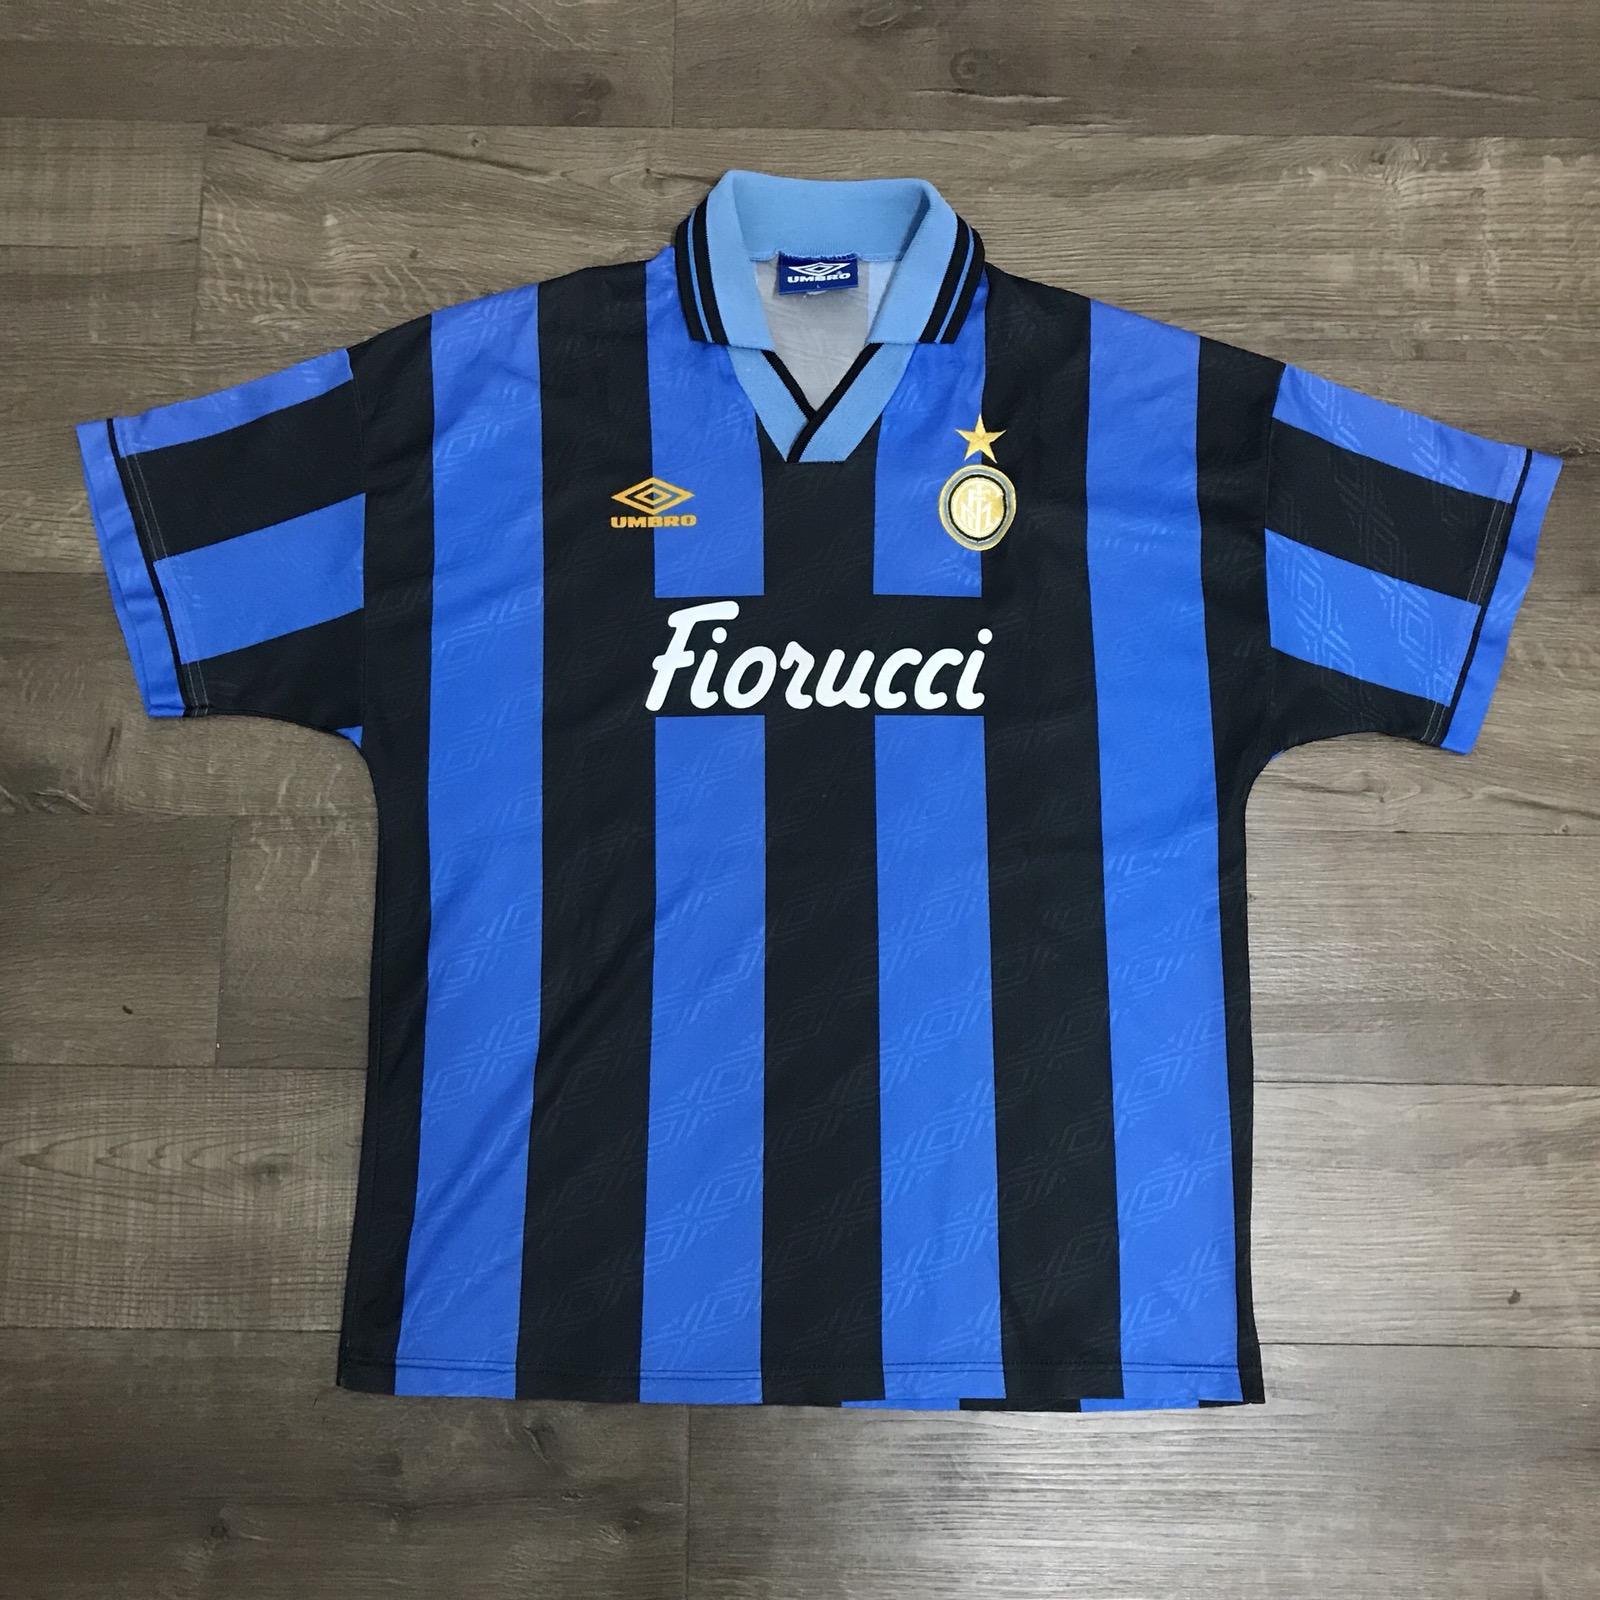 sale retailer fd45d dafa7 Vintage 94/95 Inter Milan Home Jersey